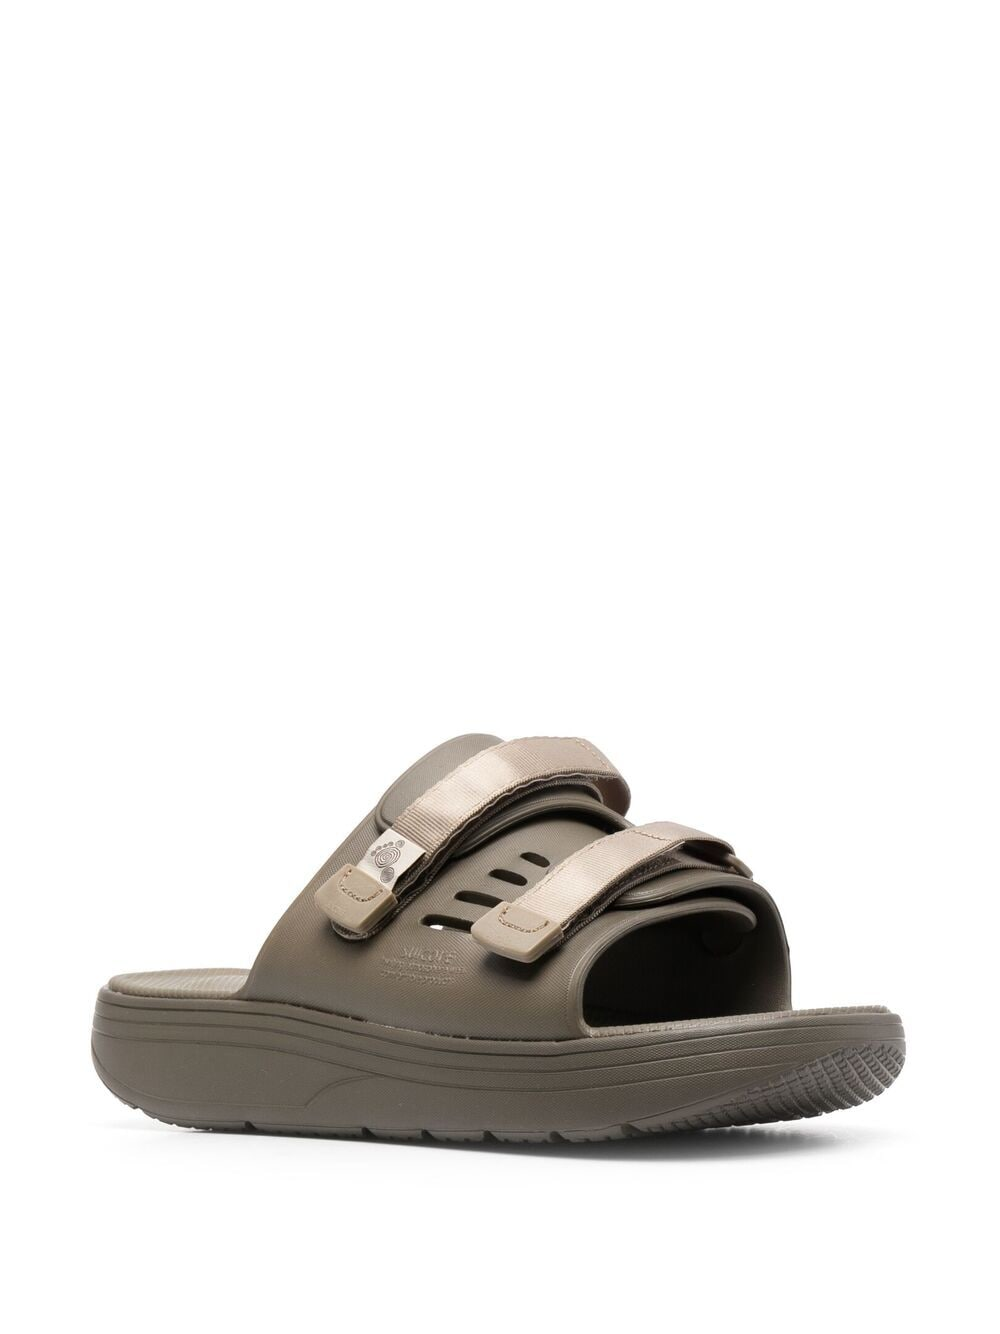 Suicoke touch strap flat sandals man green SUICOKE | Sandals | OG-INJ-01115